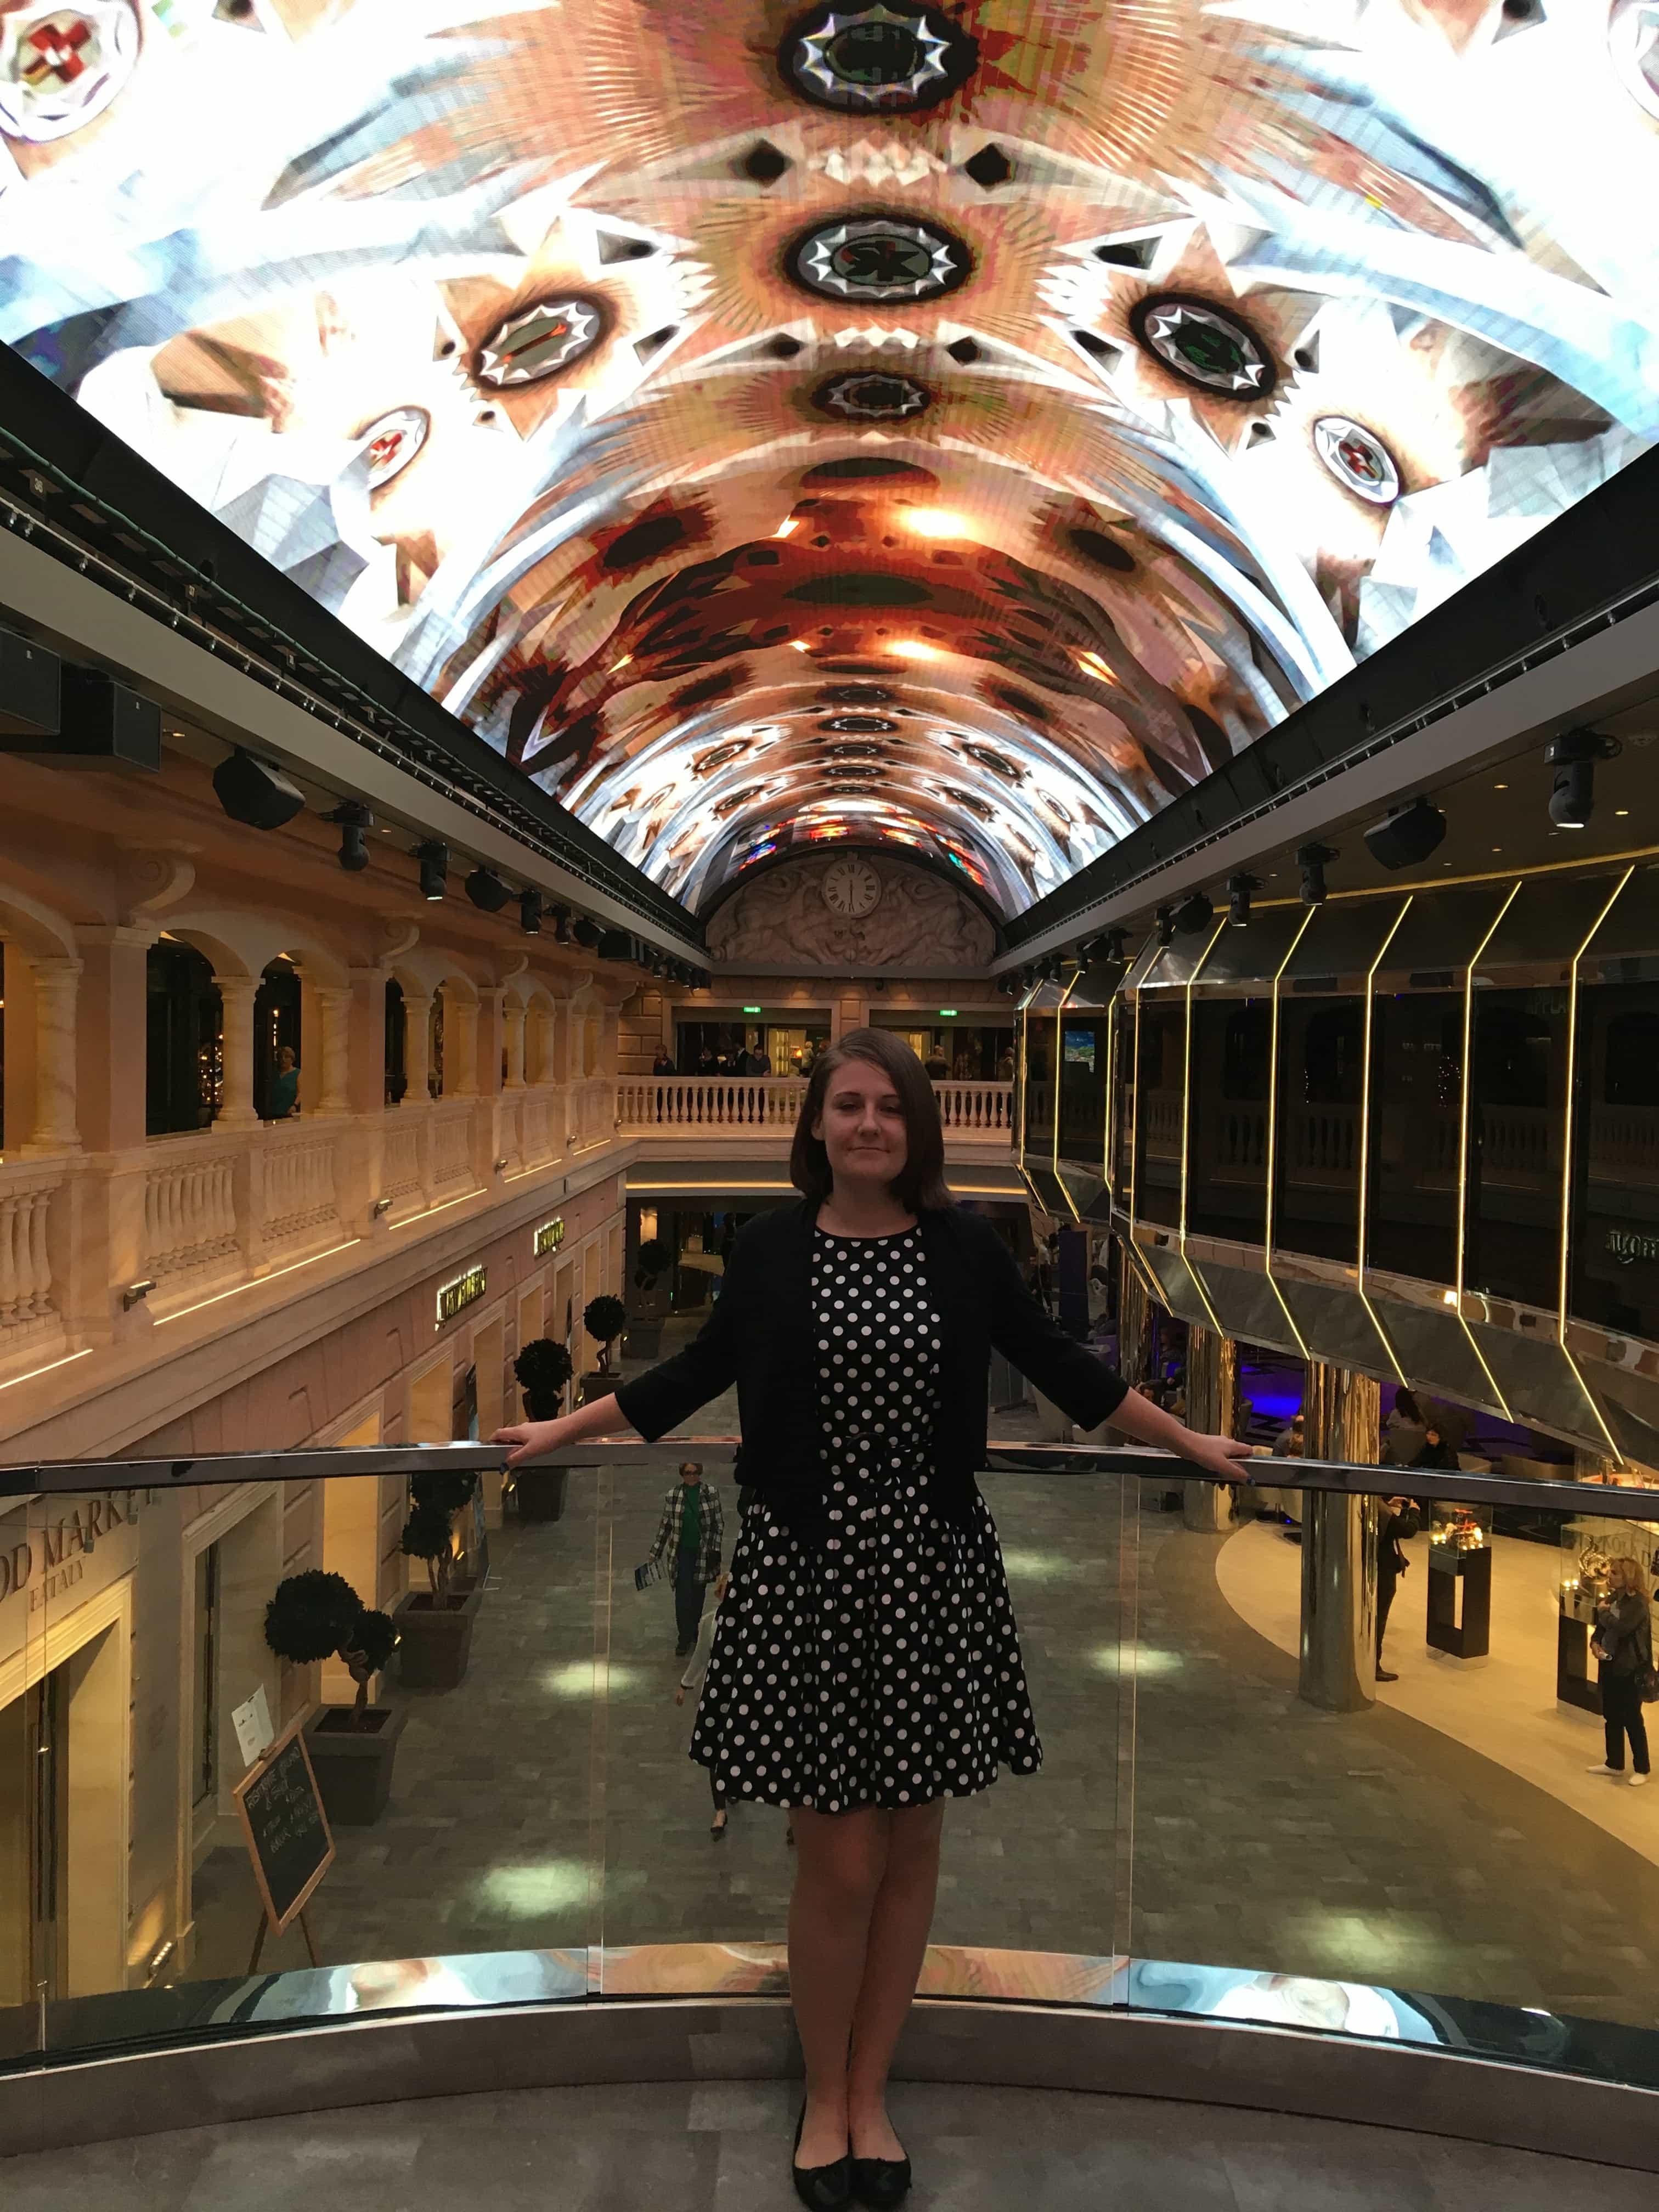 emma cruises msc meraviglia LED dome highstreet